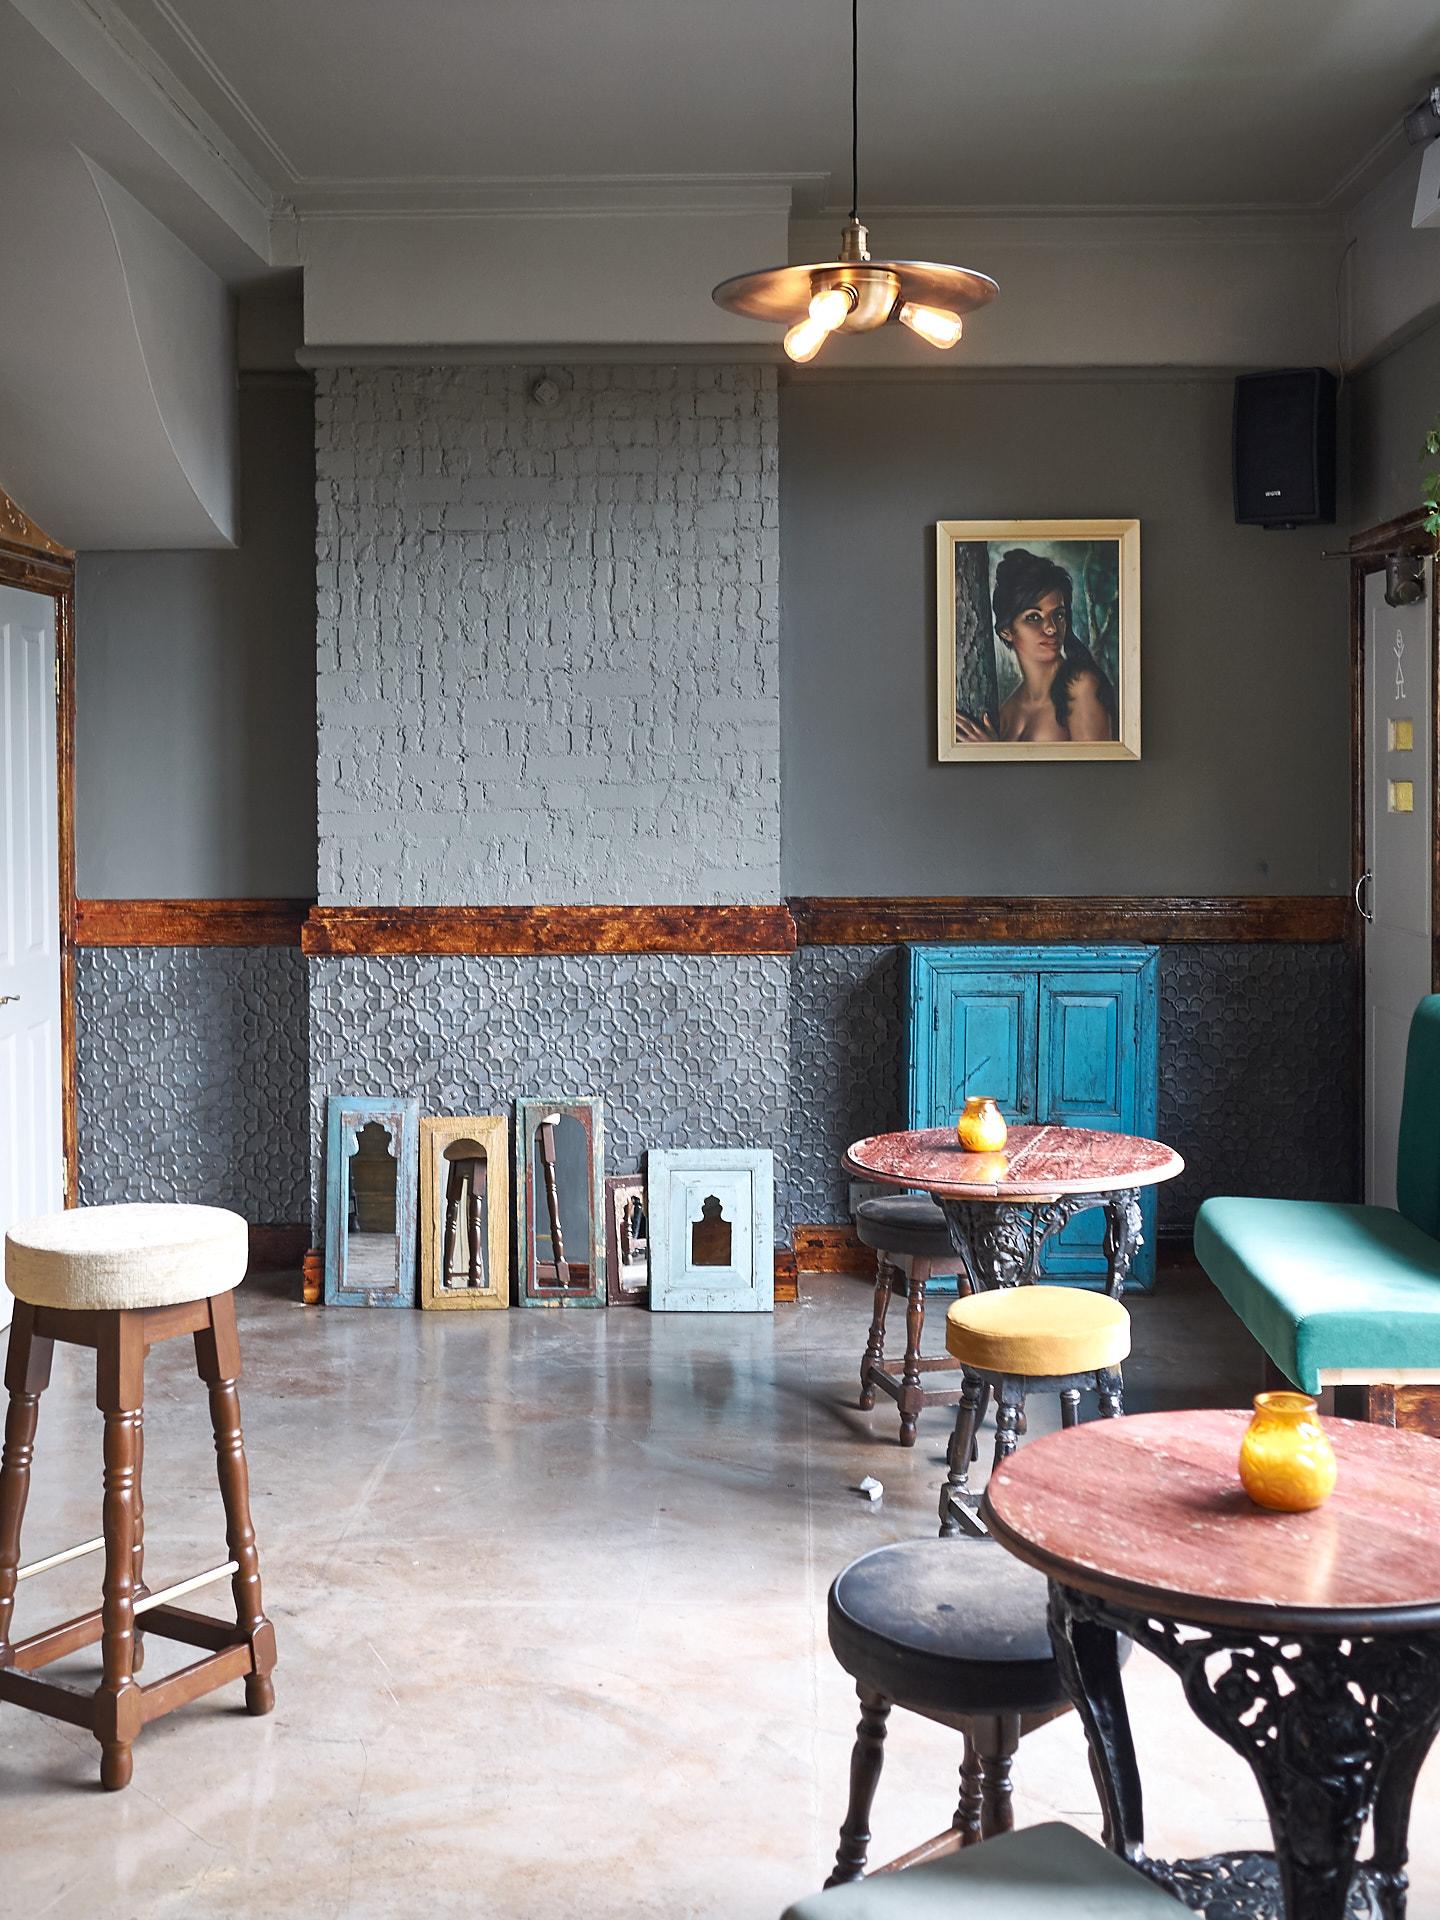 Pub interior after refurbishment.